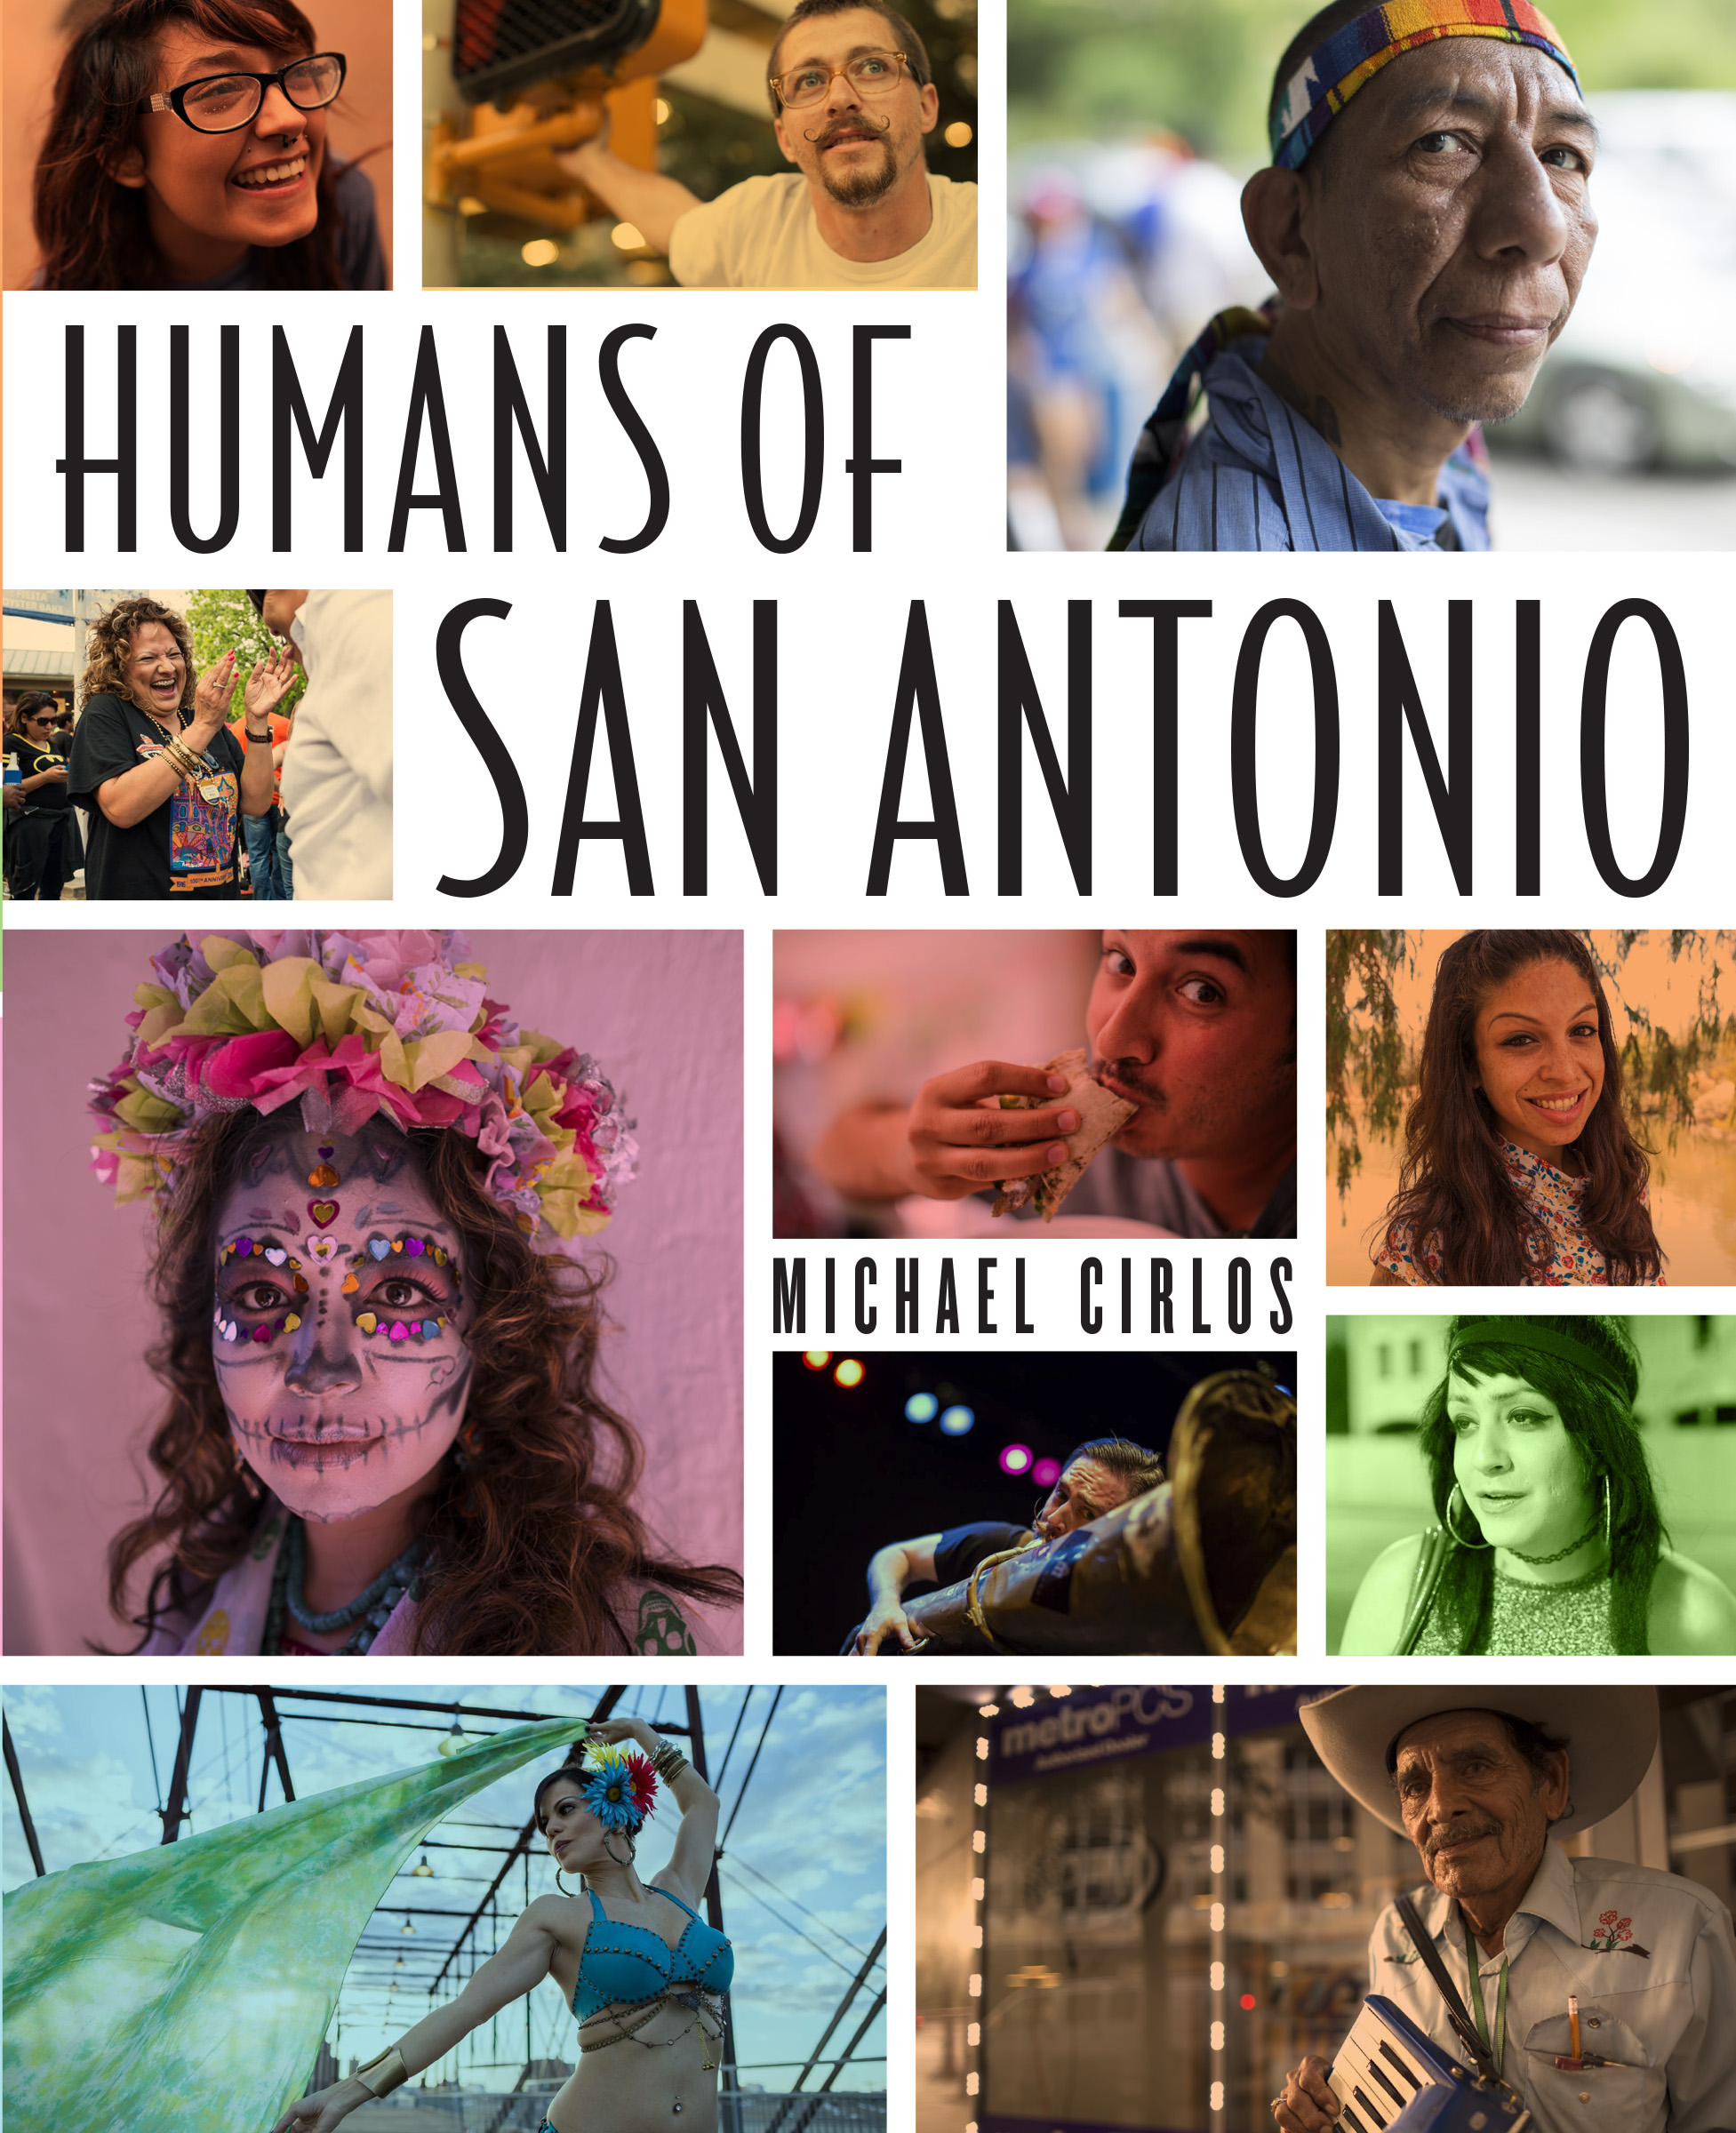 TUP_HumansSanAntonio_fullcover 4.12.18-LARGE.jpg